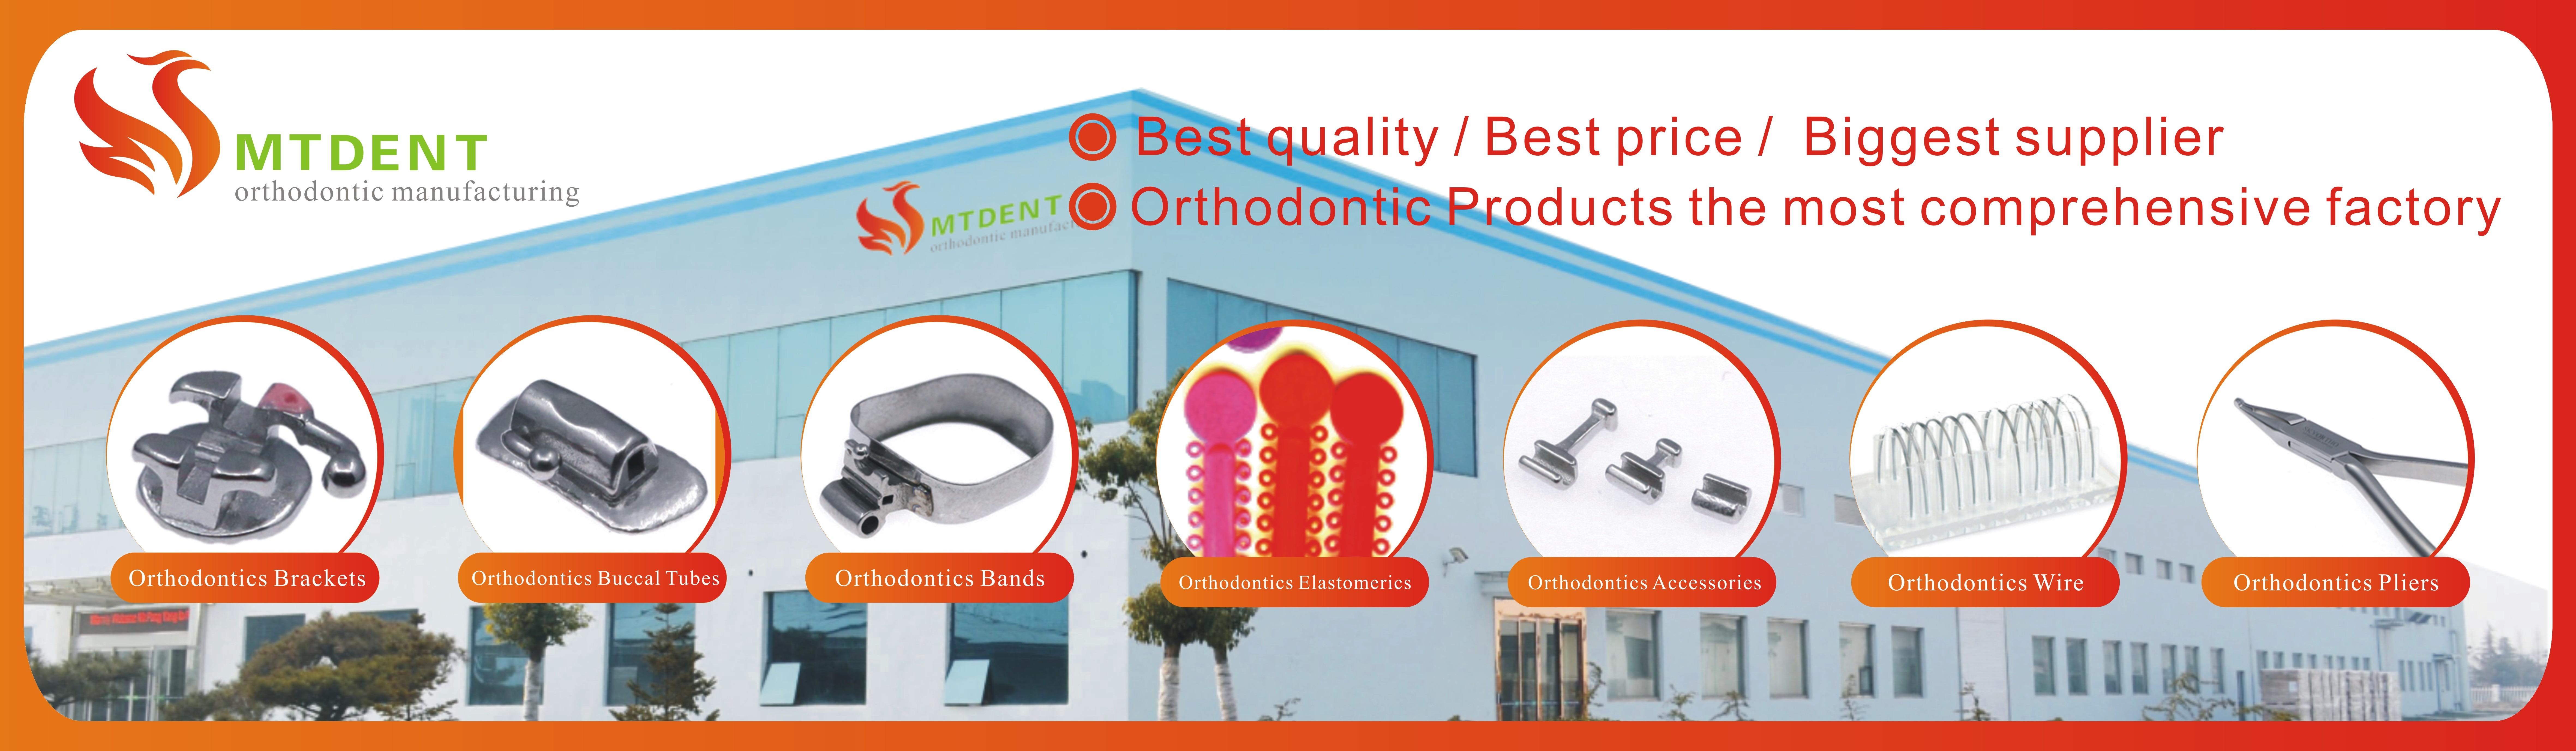 Funing Mtdental Factory - orthodontics brackets, orthodontics bands